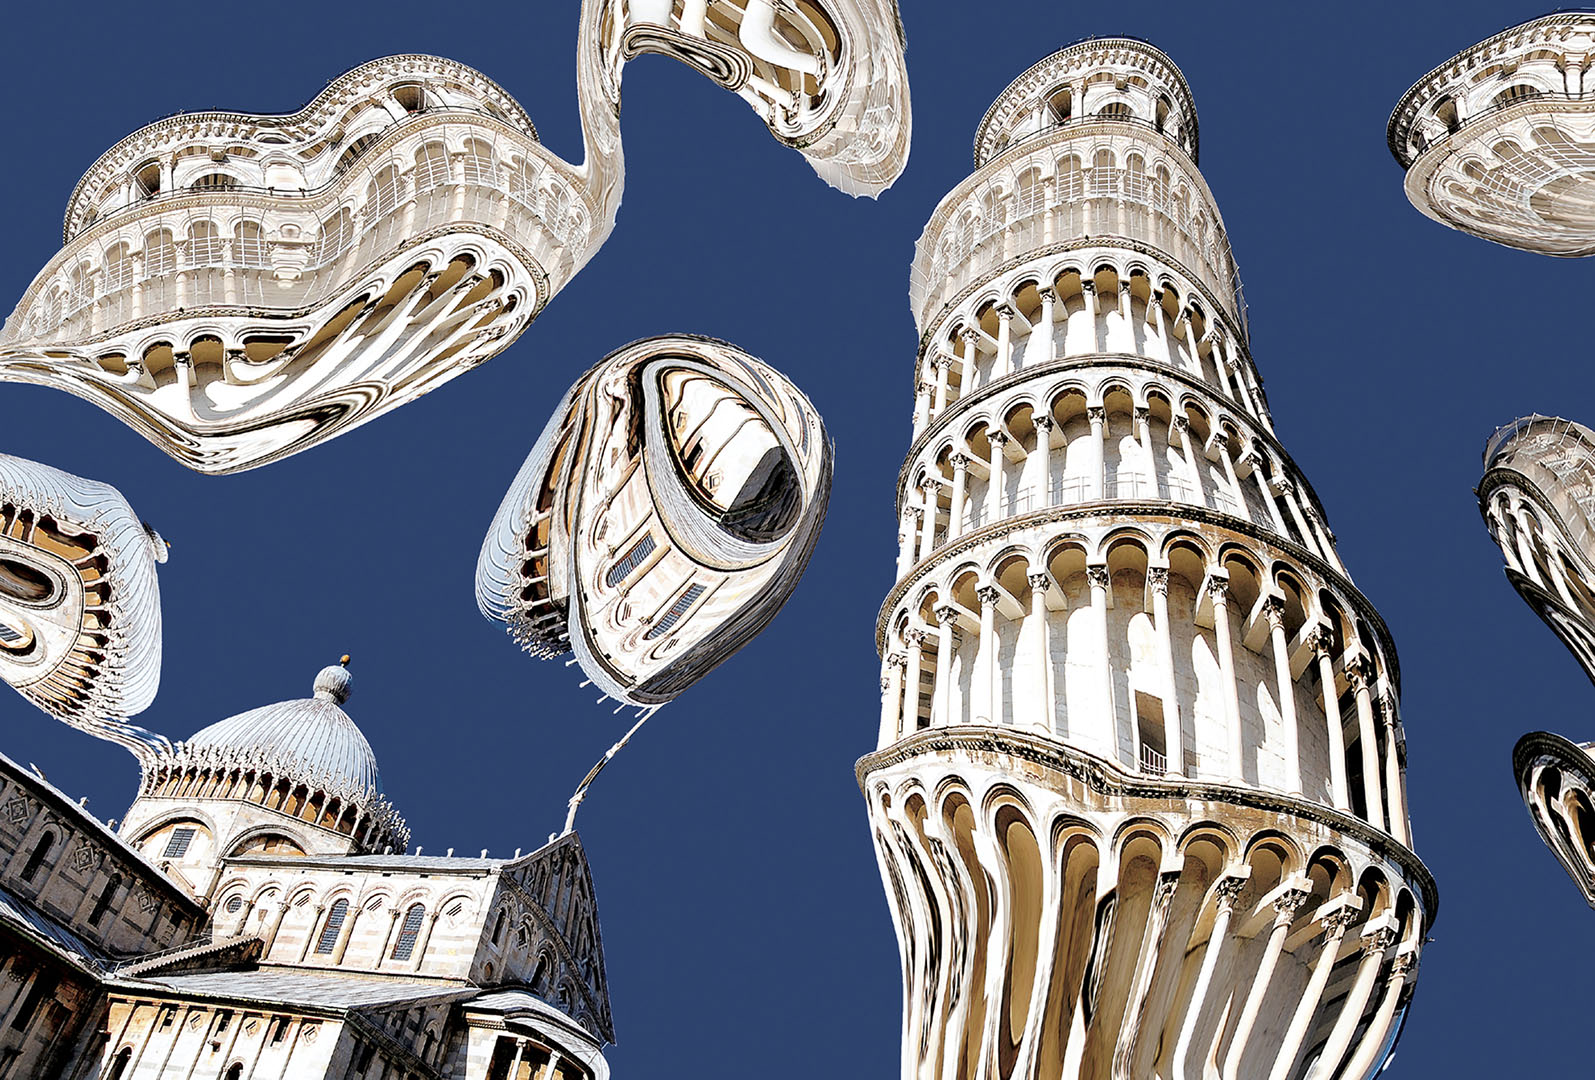 Pisa-Piazza_dei_Miracoli_003_I08-10.54